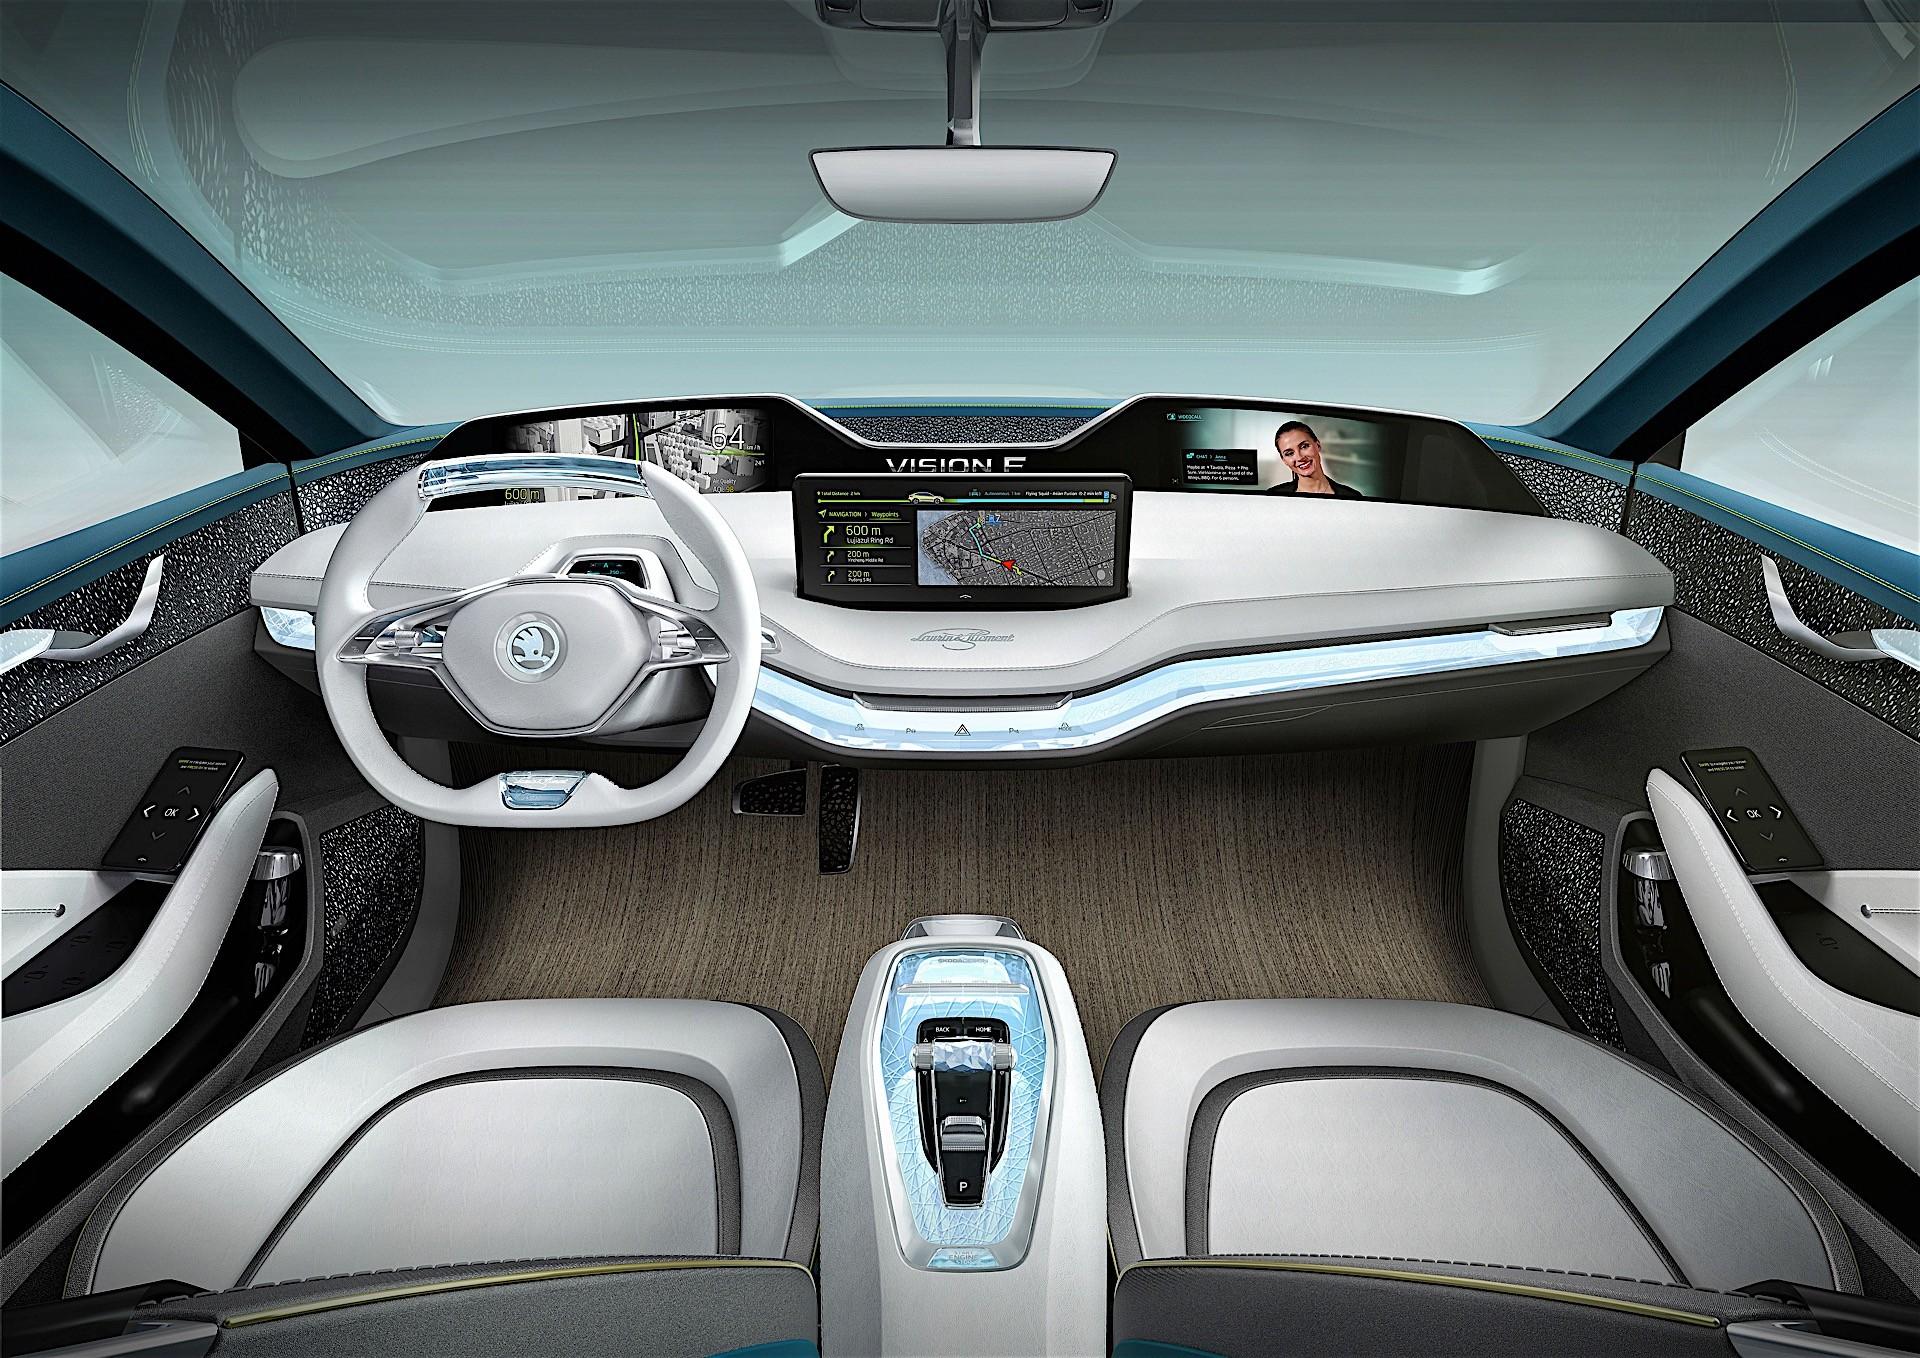 Skoda EV Confirmed For 2020, Superb PHEV Coming In 2019 - autoevolution